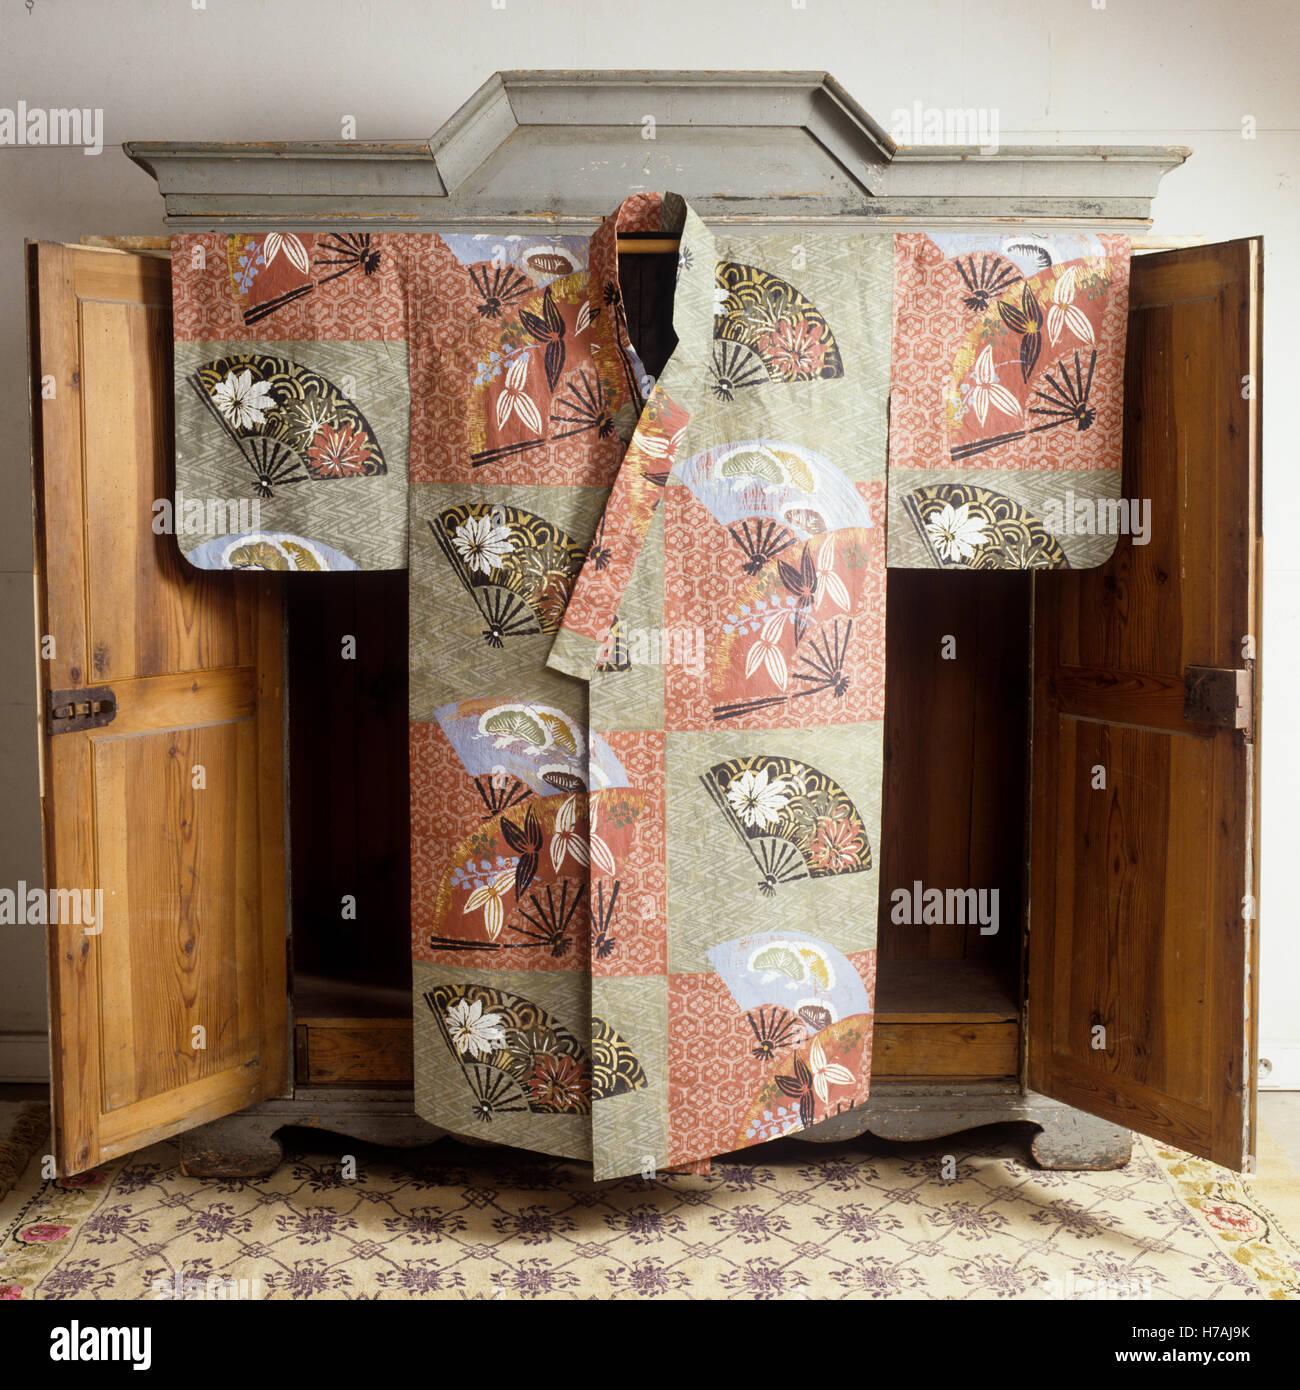 Kimono with fan shaped motif, historical replica paper costume by Isabelle de Borchgrave - Stock Image